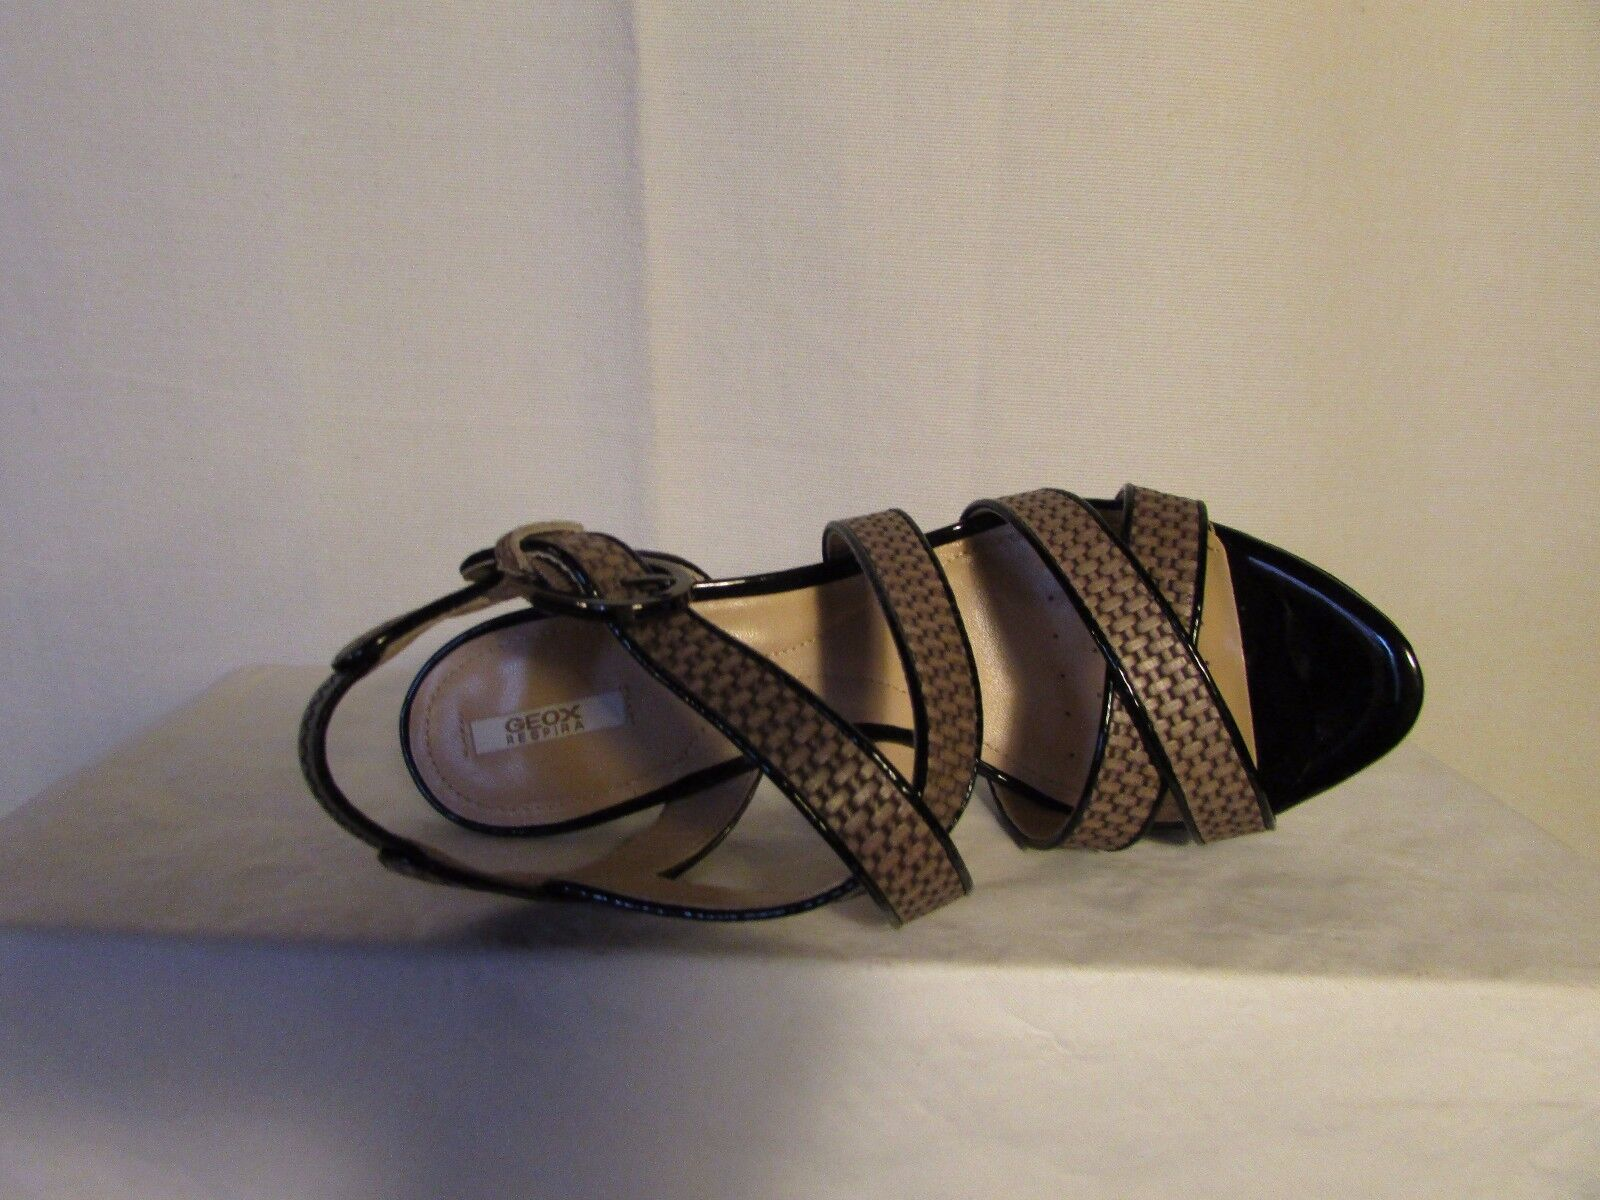 Sandalen geschmückt GEOX Leder taupe taupe taupe imitation Weberei und Leder schwarz 38 f8215e